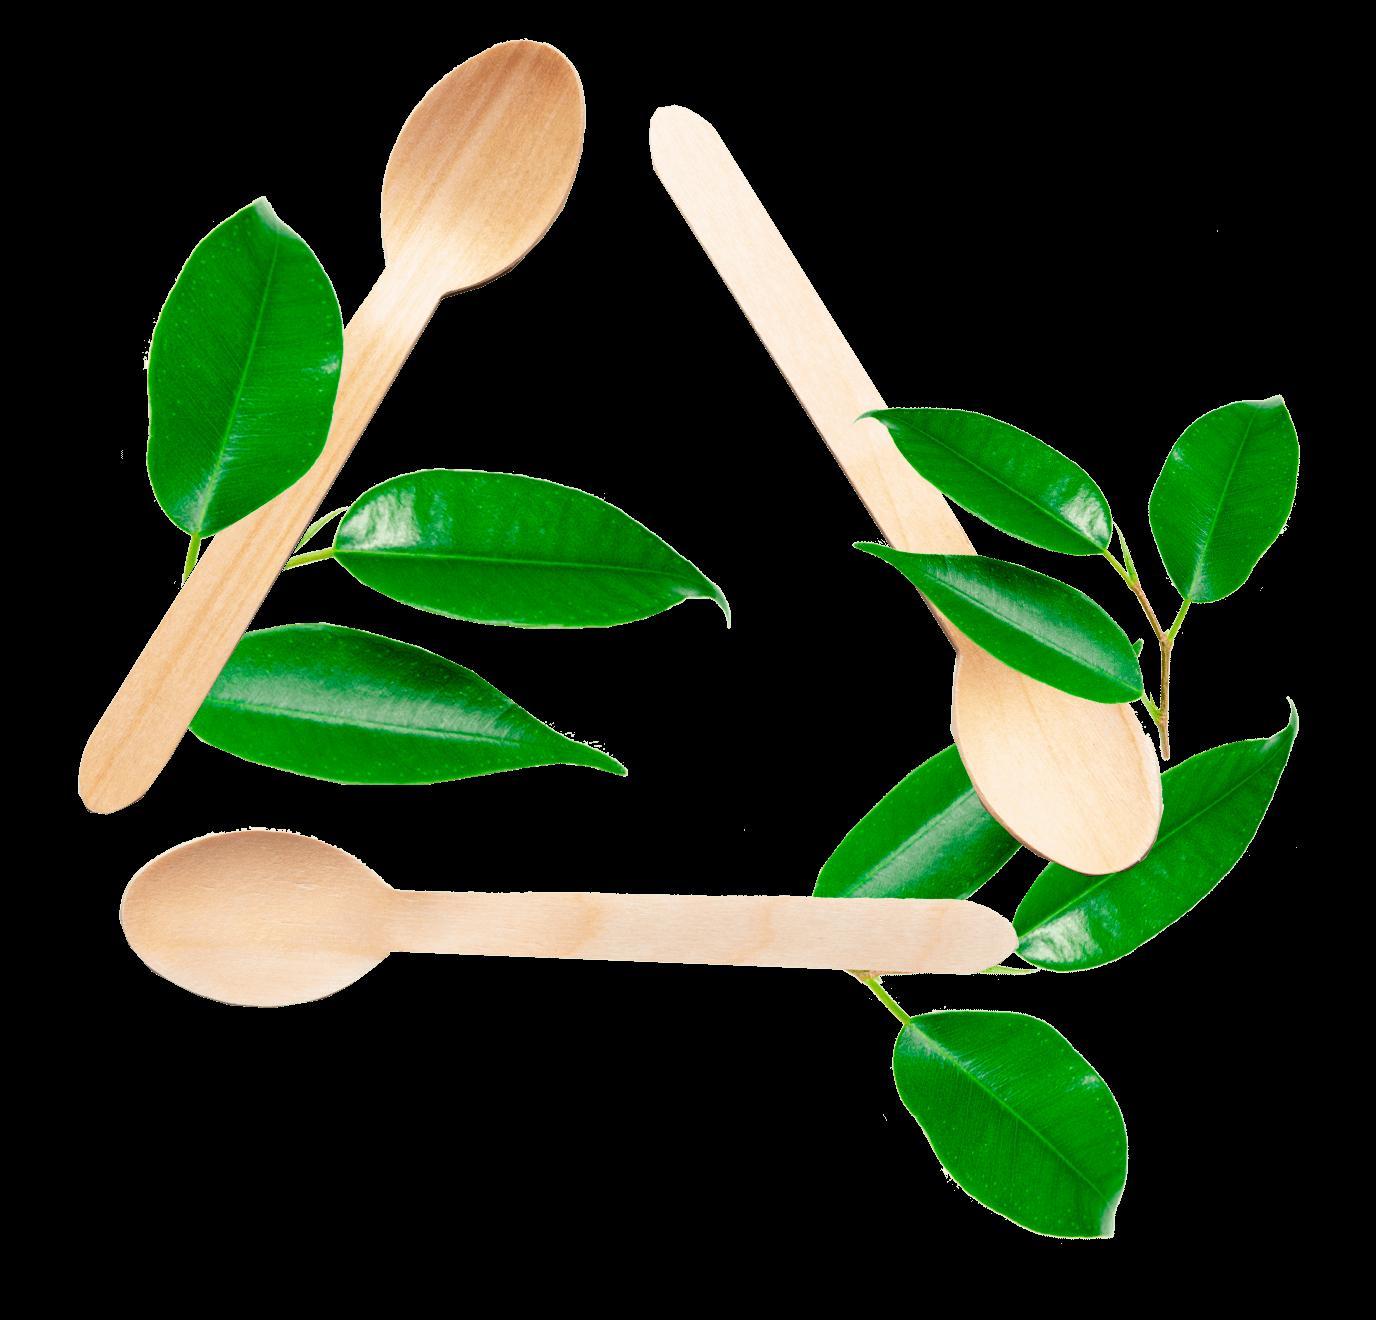 MADERA - Envases biodegradables ECOLINE